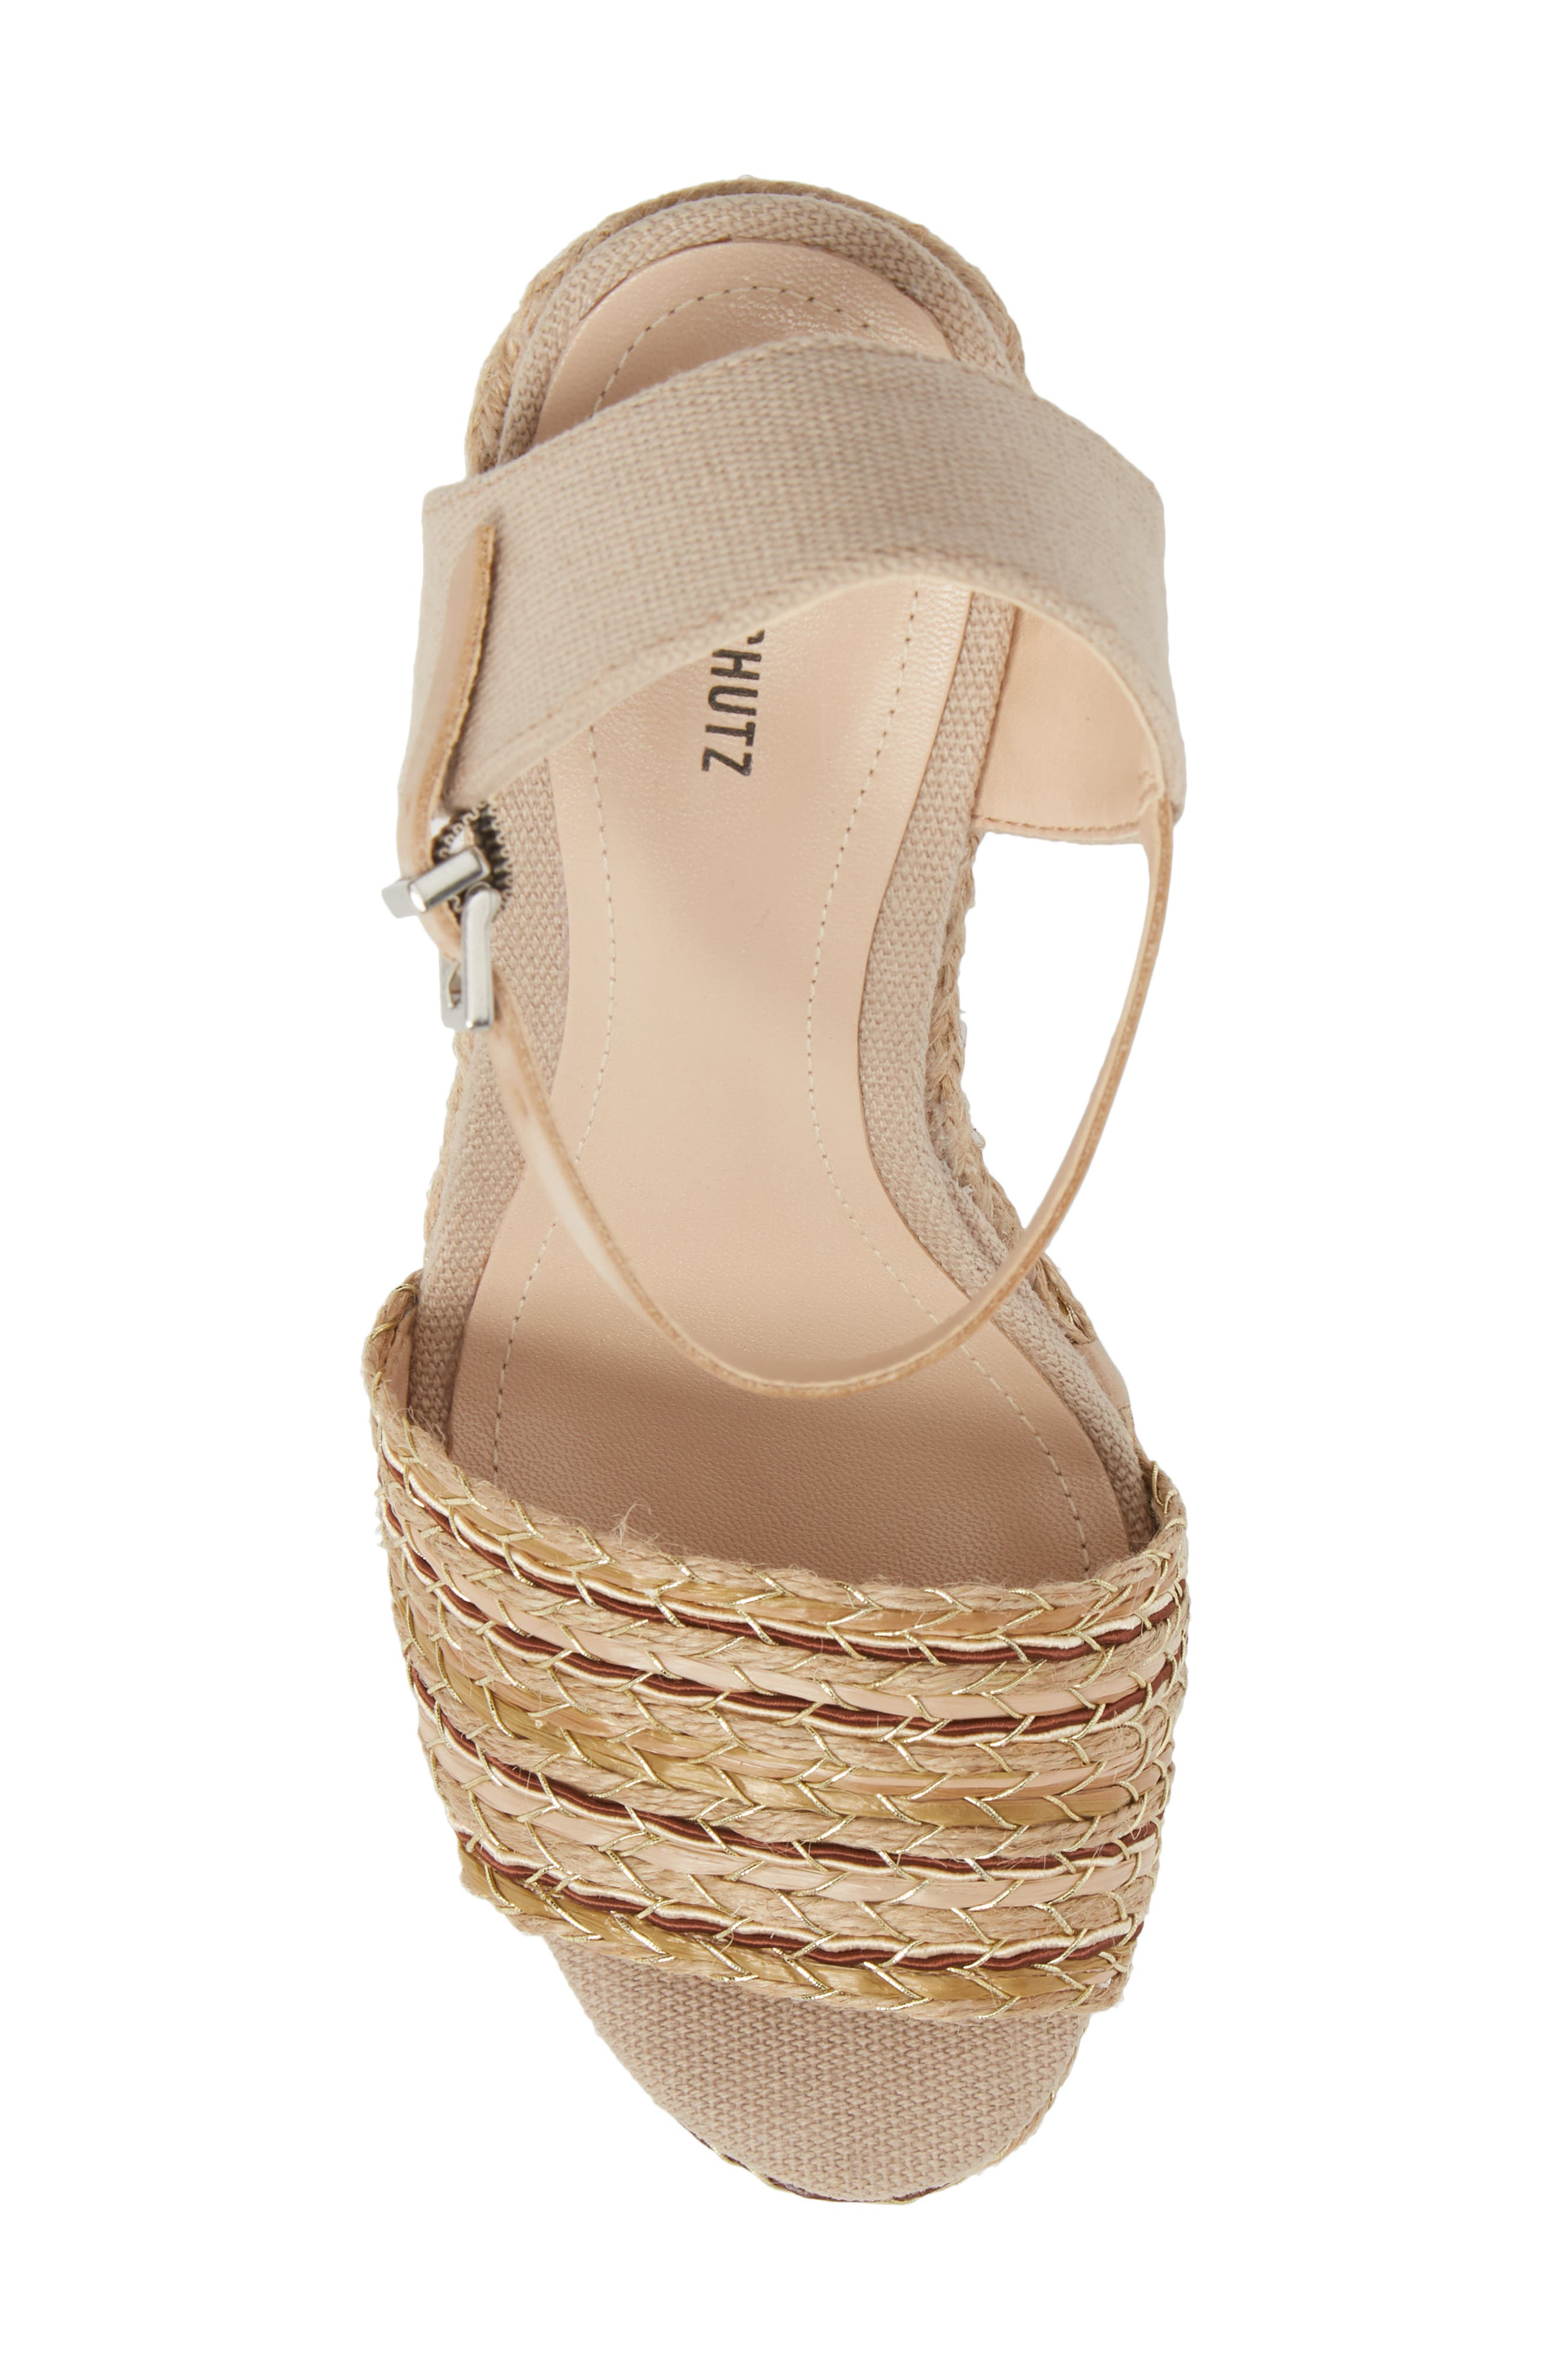 Rilark Platform Wedge Sandal,                             Alternate thumbnail 5, color,                             COCO FABRIC